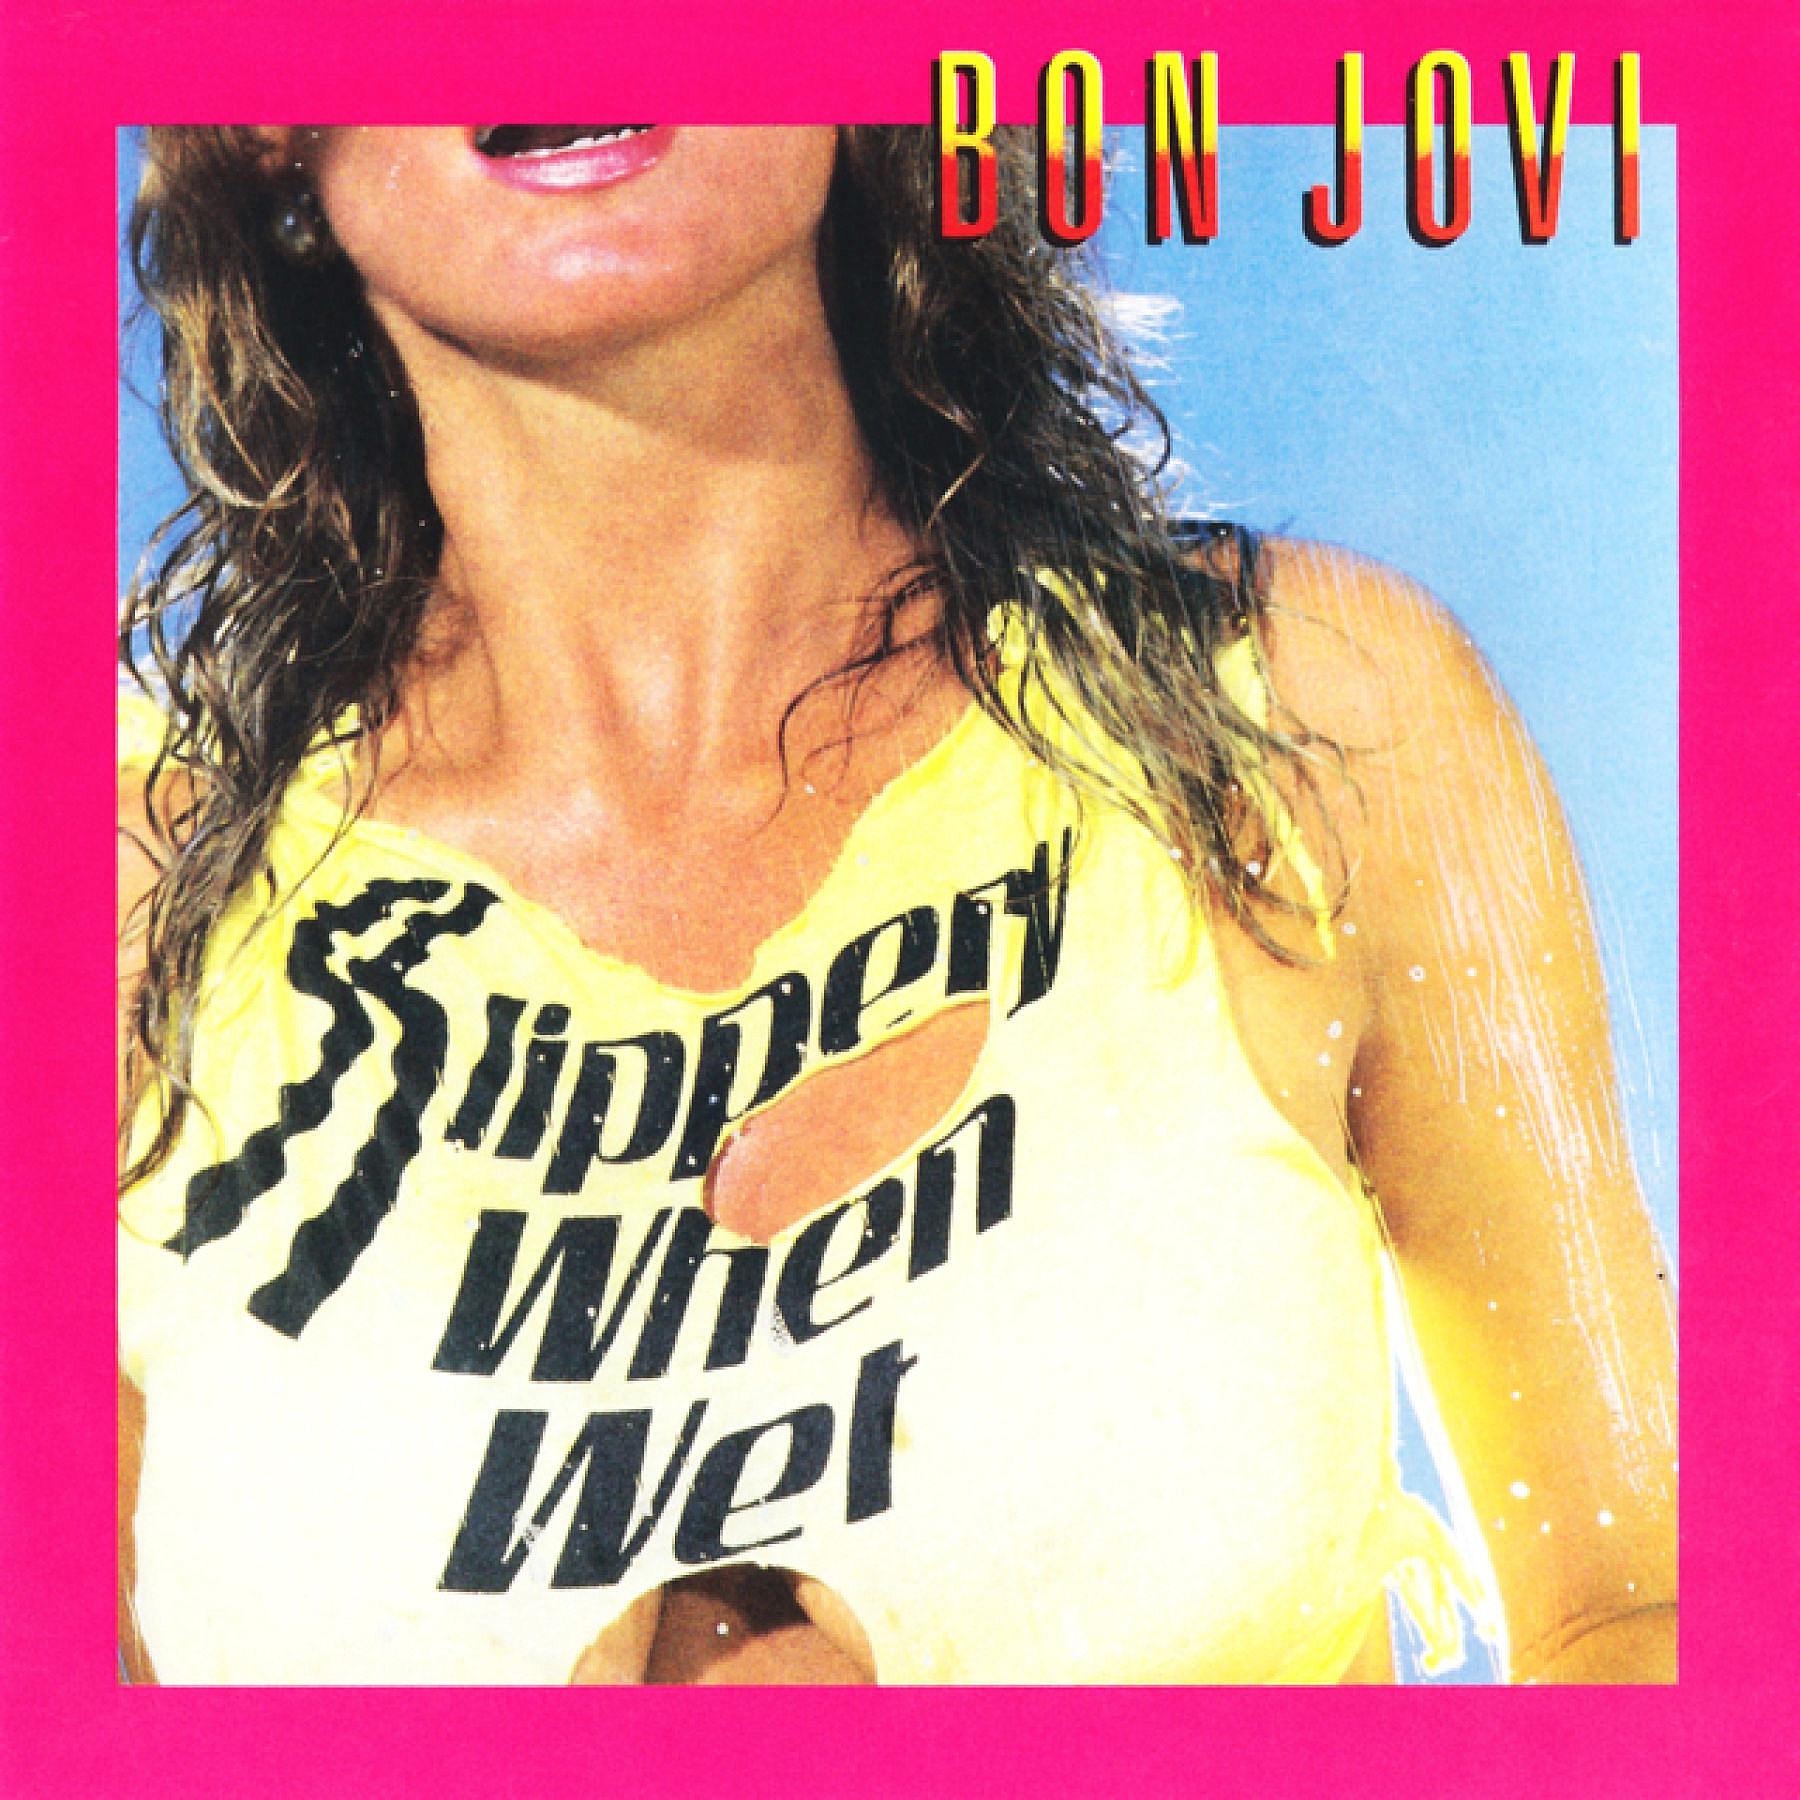 bon jovi �slippery when wet� bon jovi slippery when wet